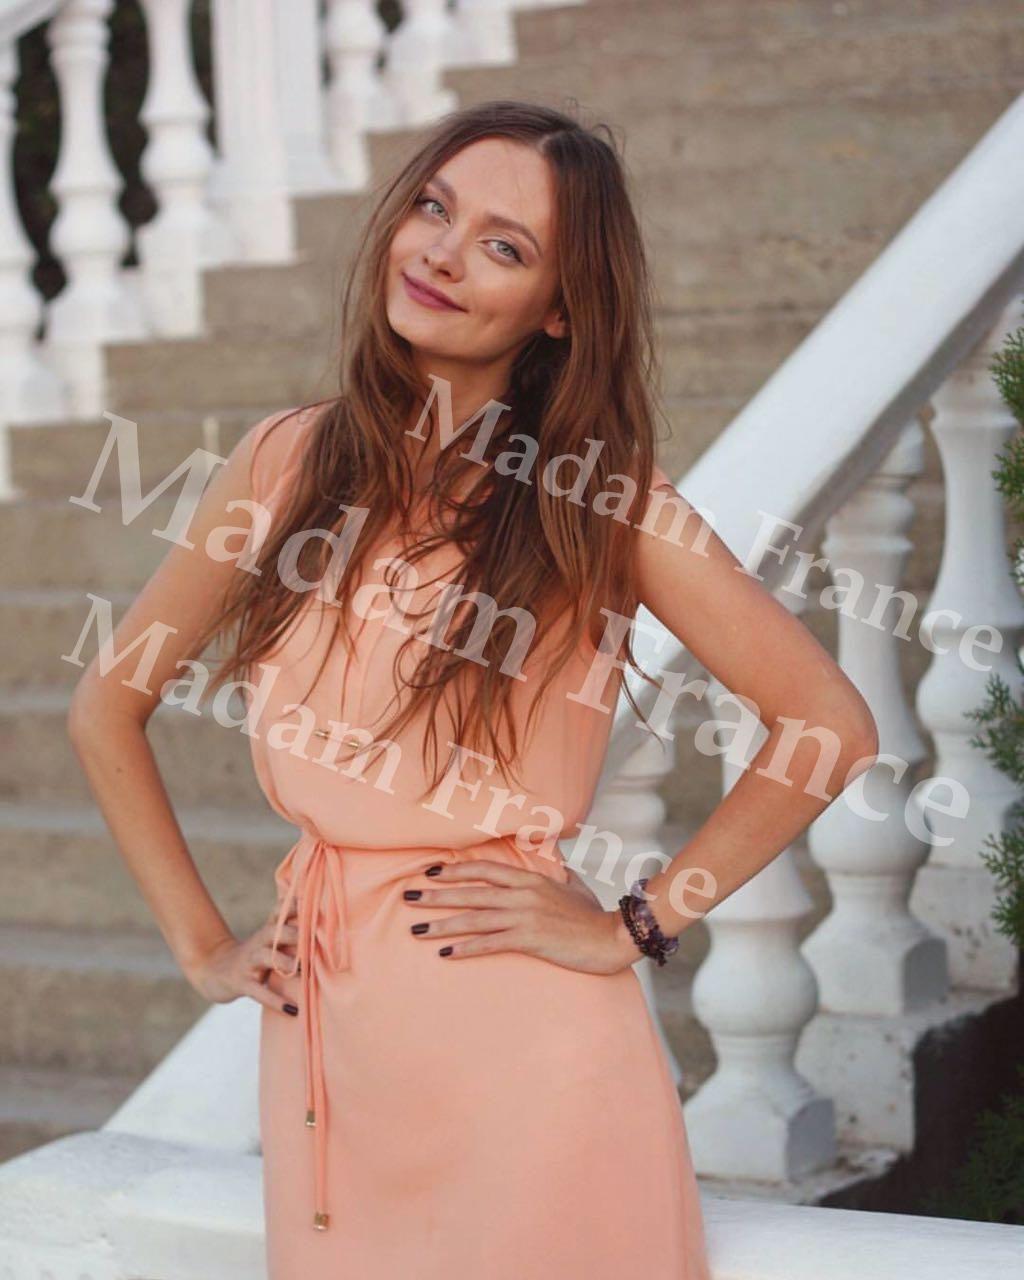 Rita main photo on Madam France